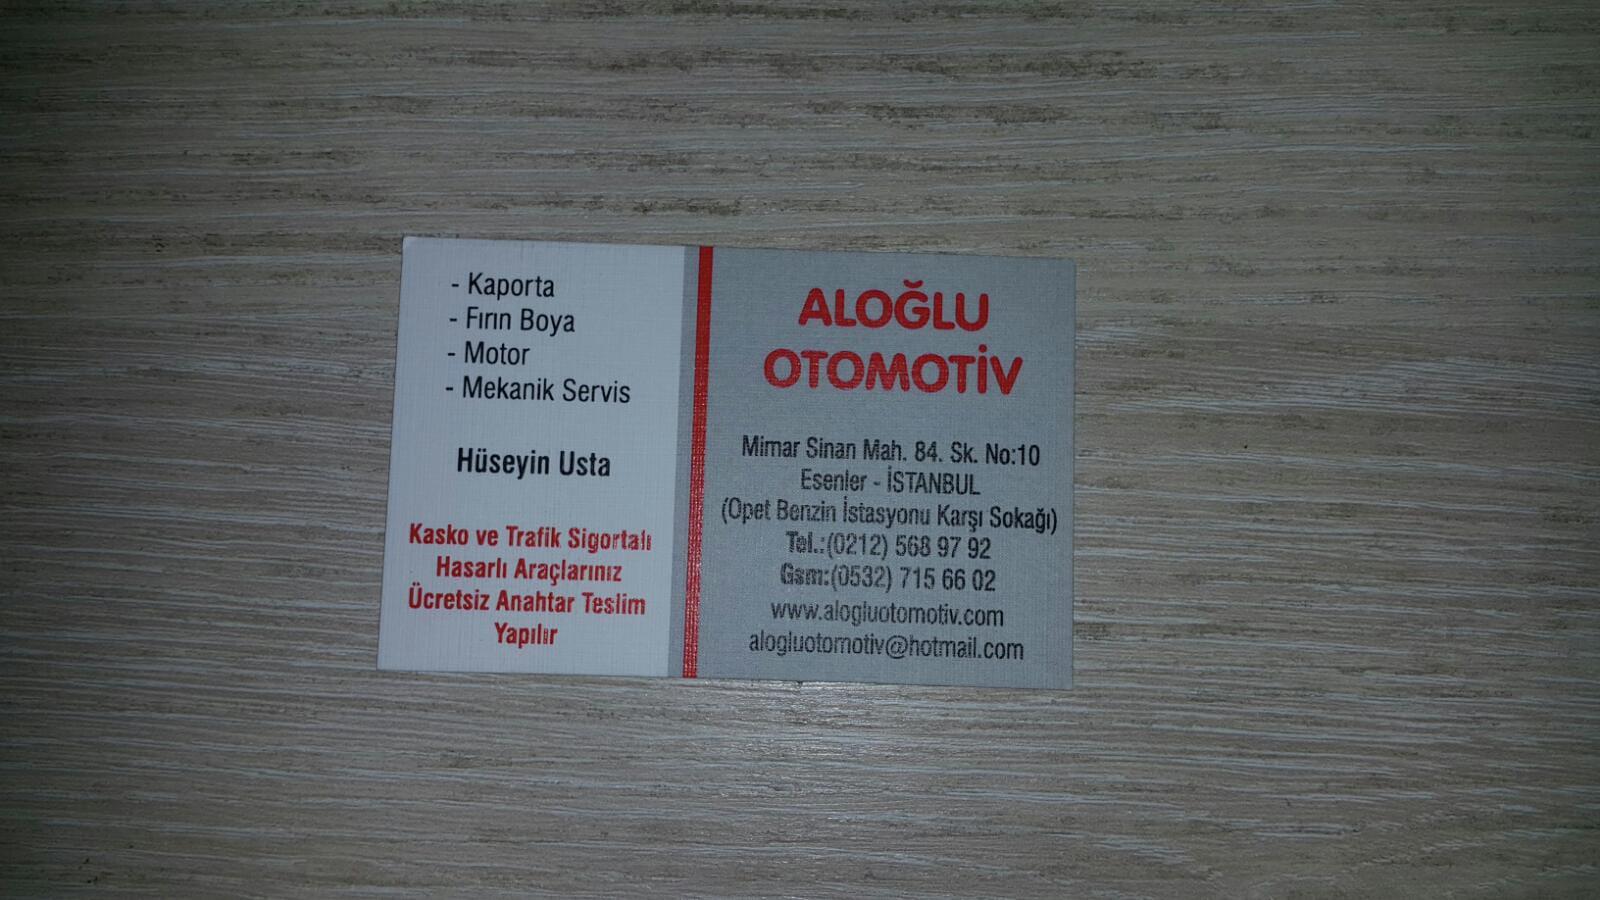 Aloğlu Otomotiv